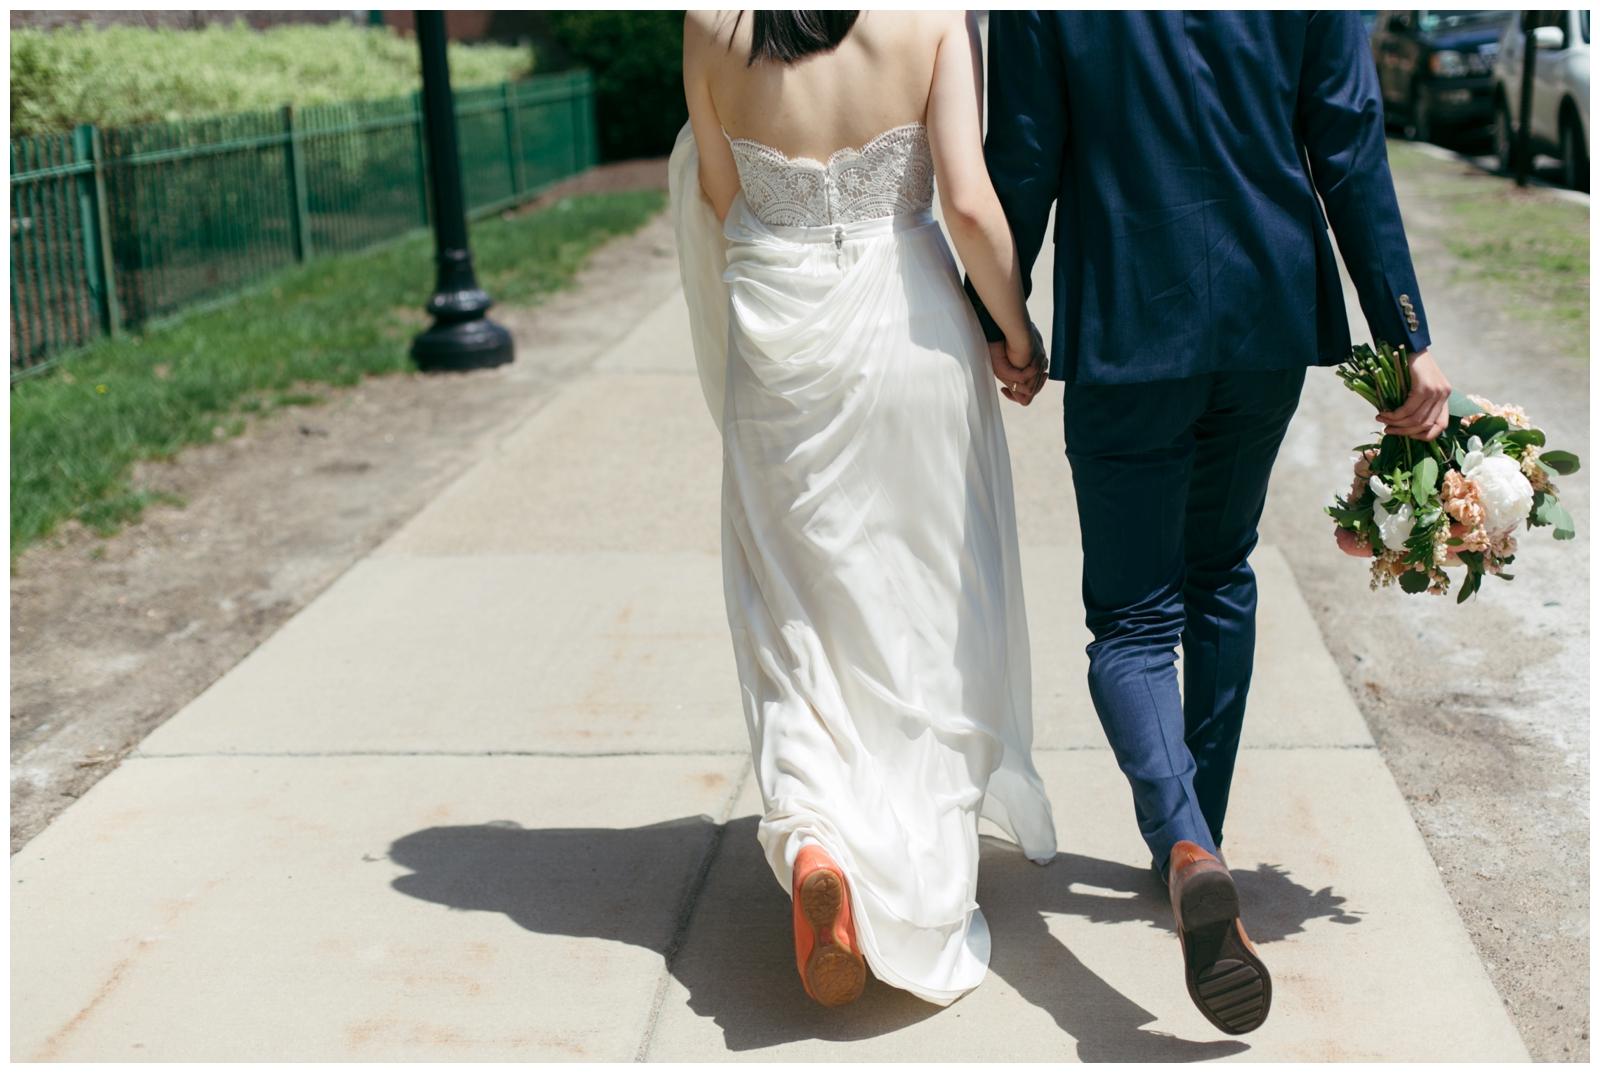 Samberg-Conference-Center-Boston-Wedding-Photographer-Bailey-Q-Photo-087.jpg